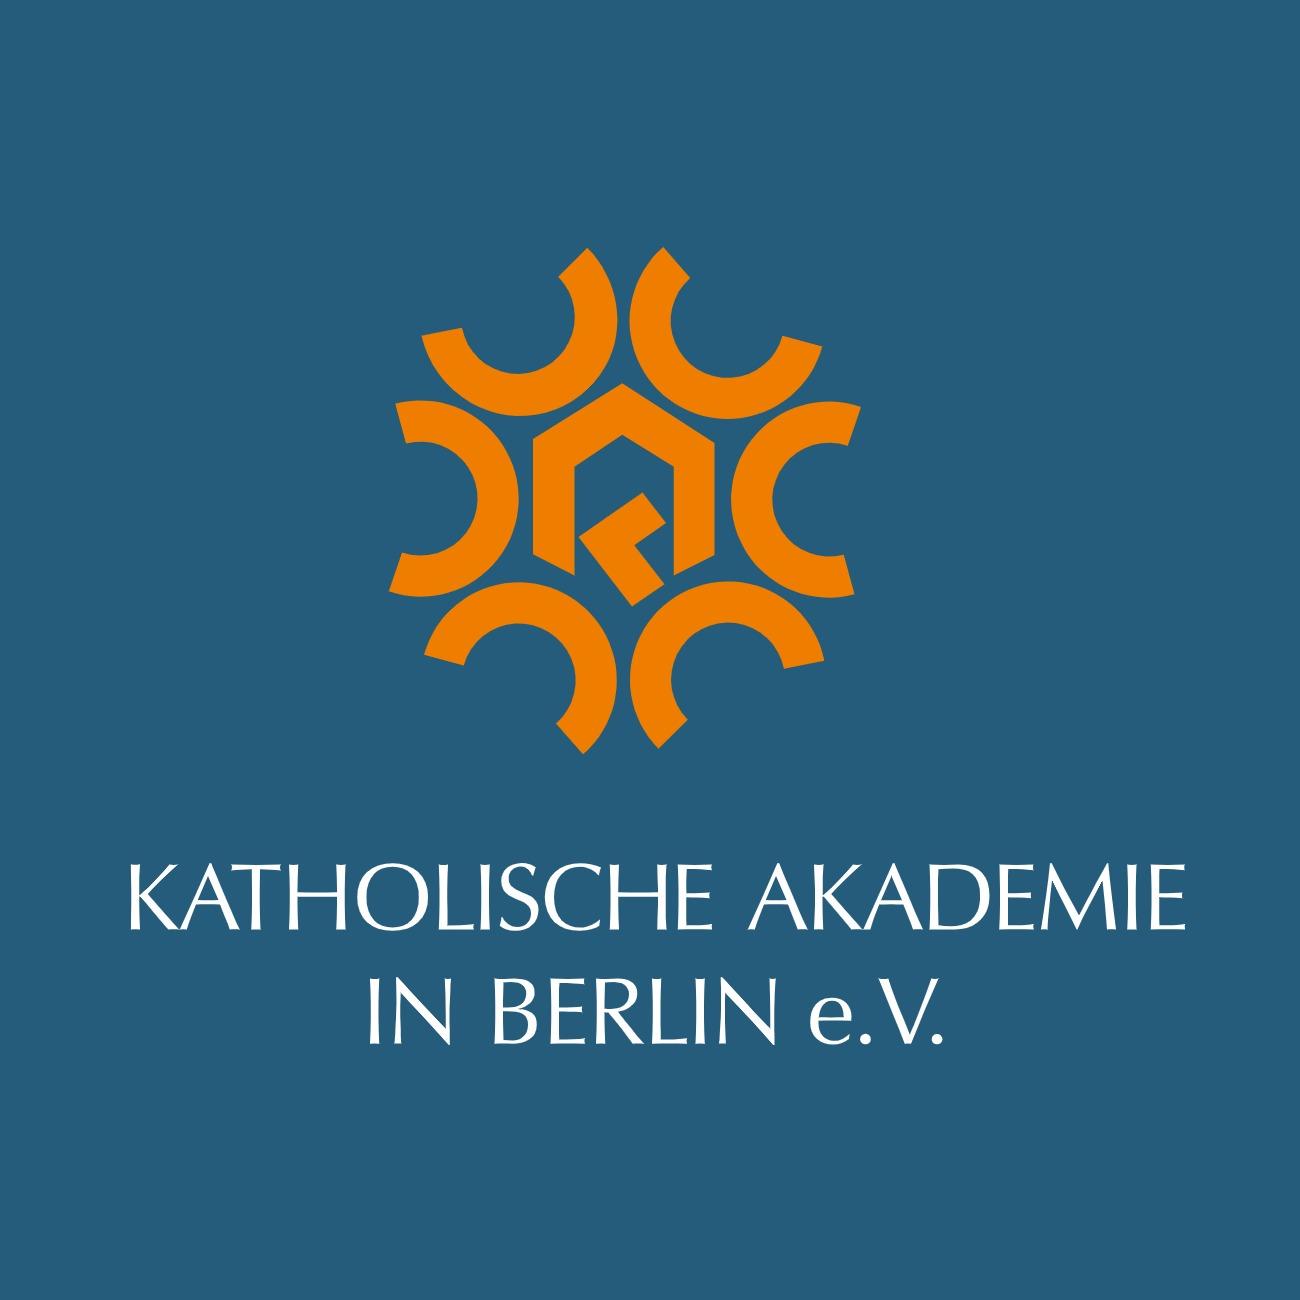 katholische akademie berlin logo